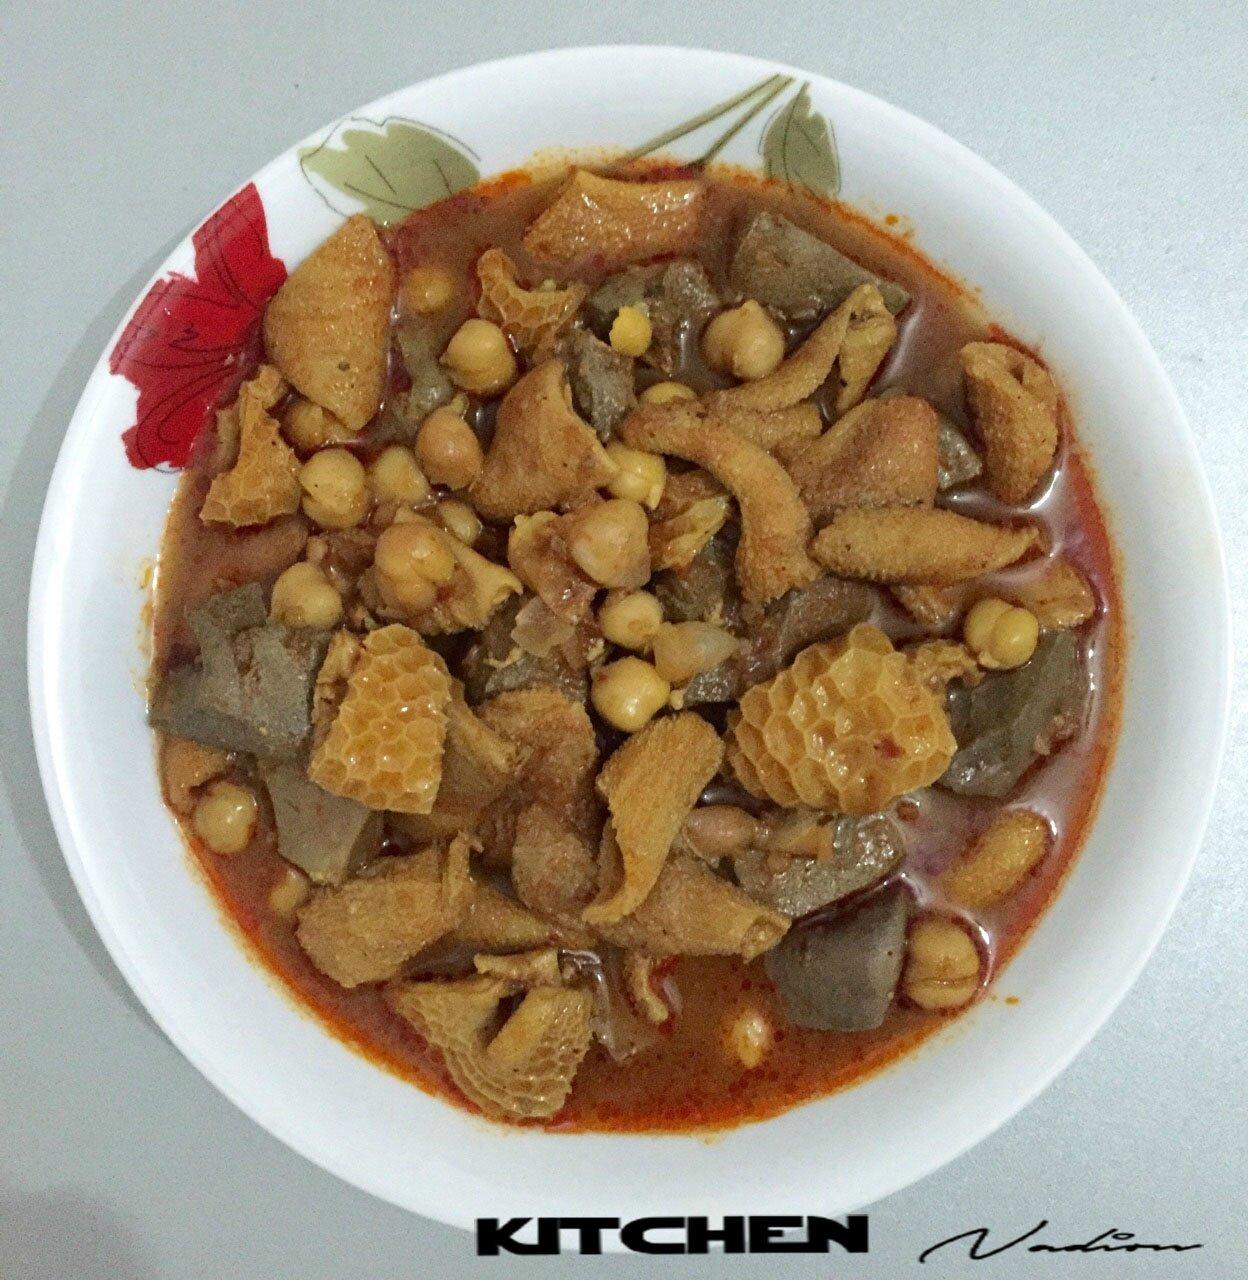 Cuisine alg rienne kitchen nadion for Algerienne cuisine